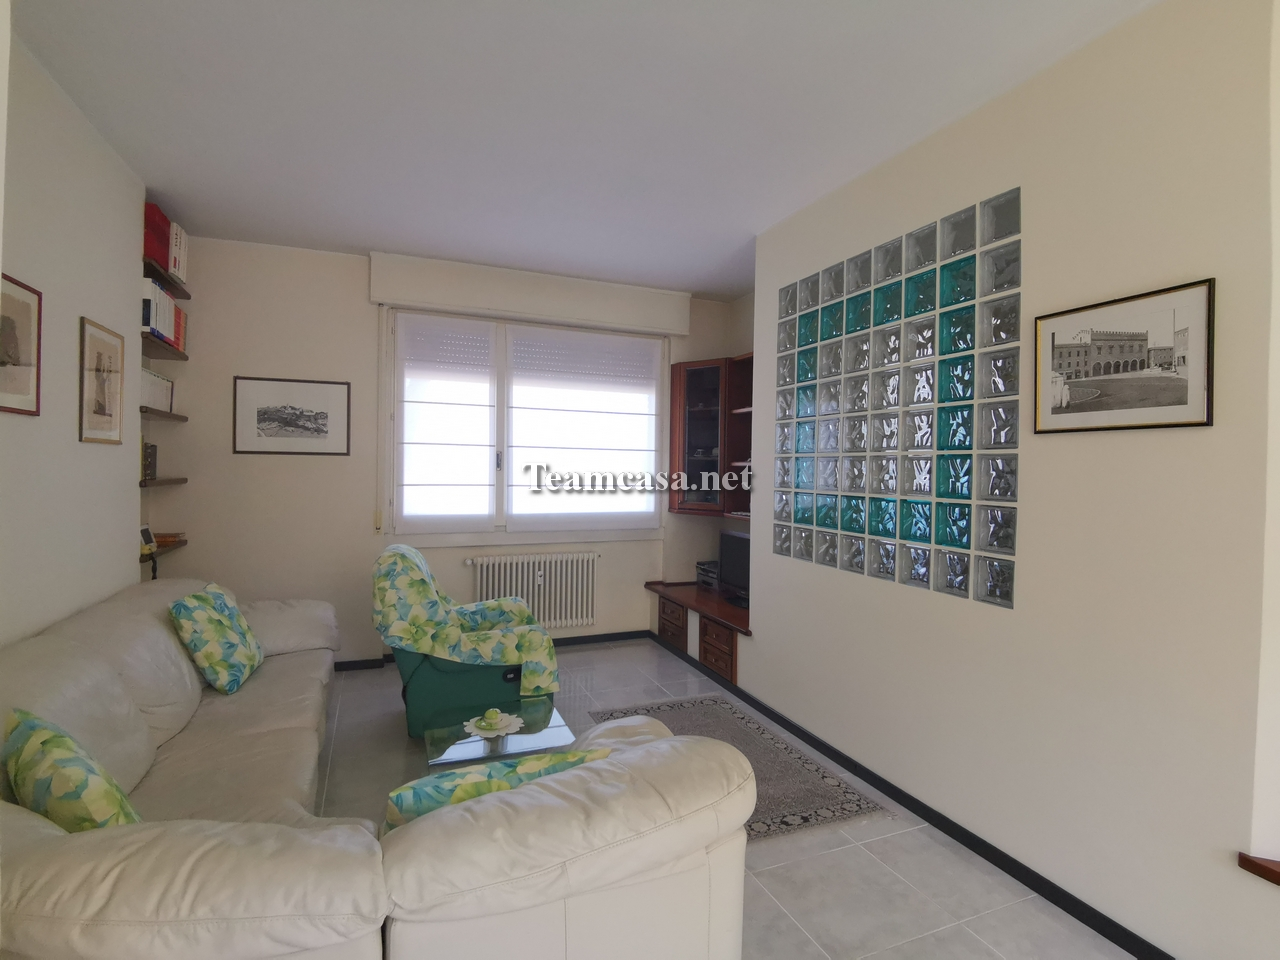 Appartamento, VIA MARSIGLIA, Vendita - Pesaro (Pesaro Urbino)